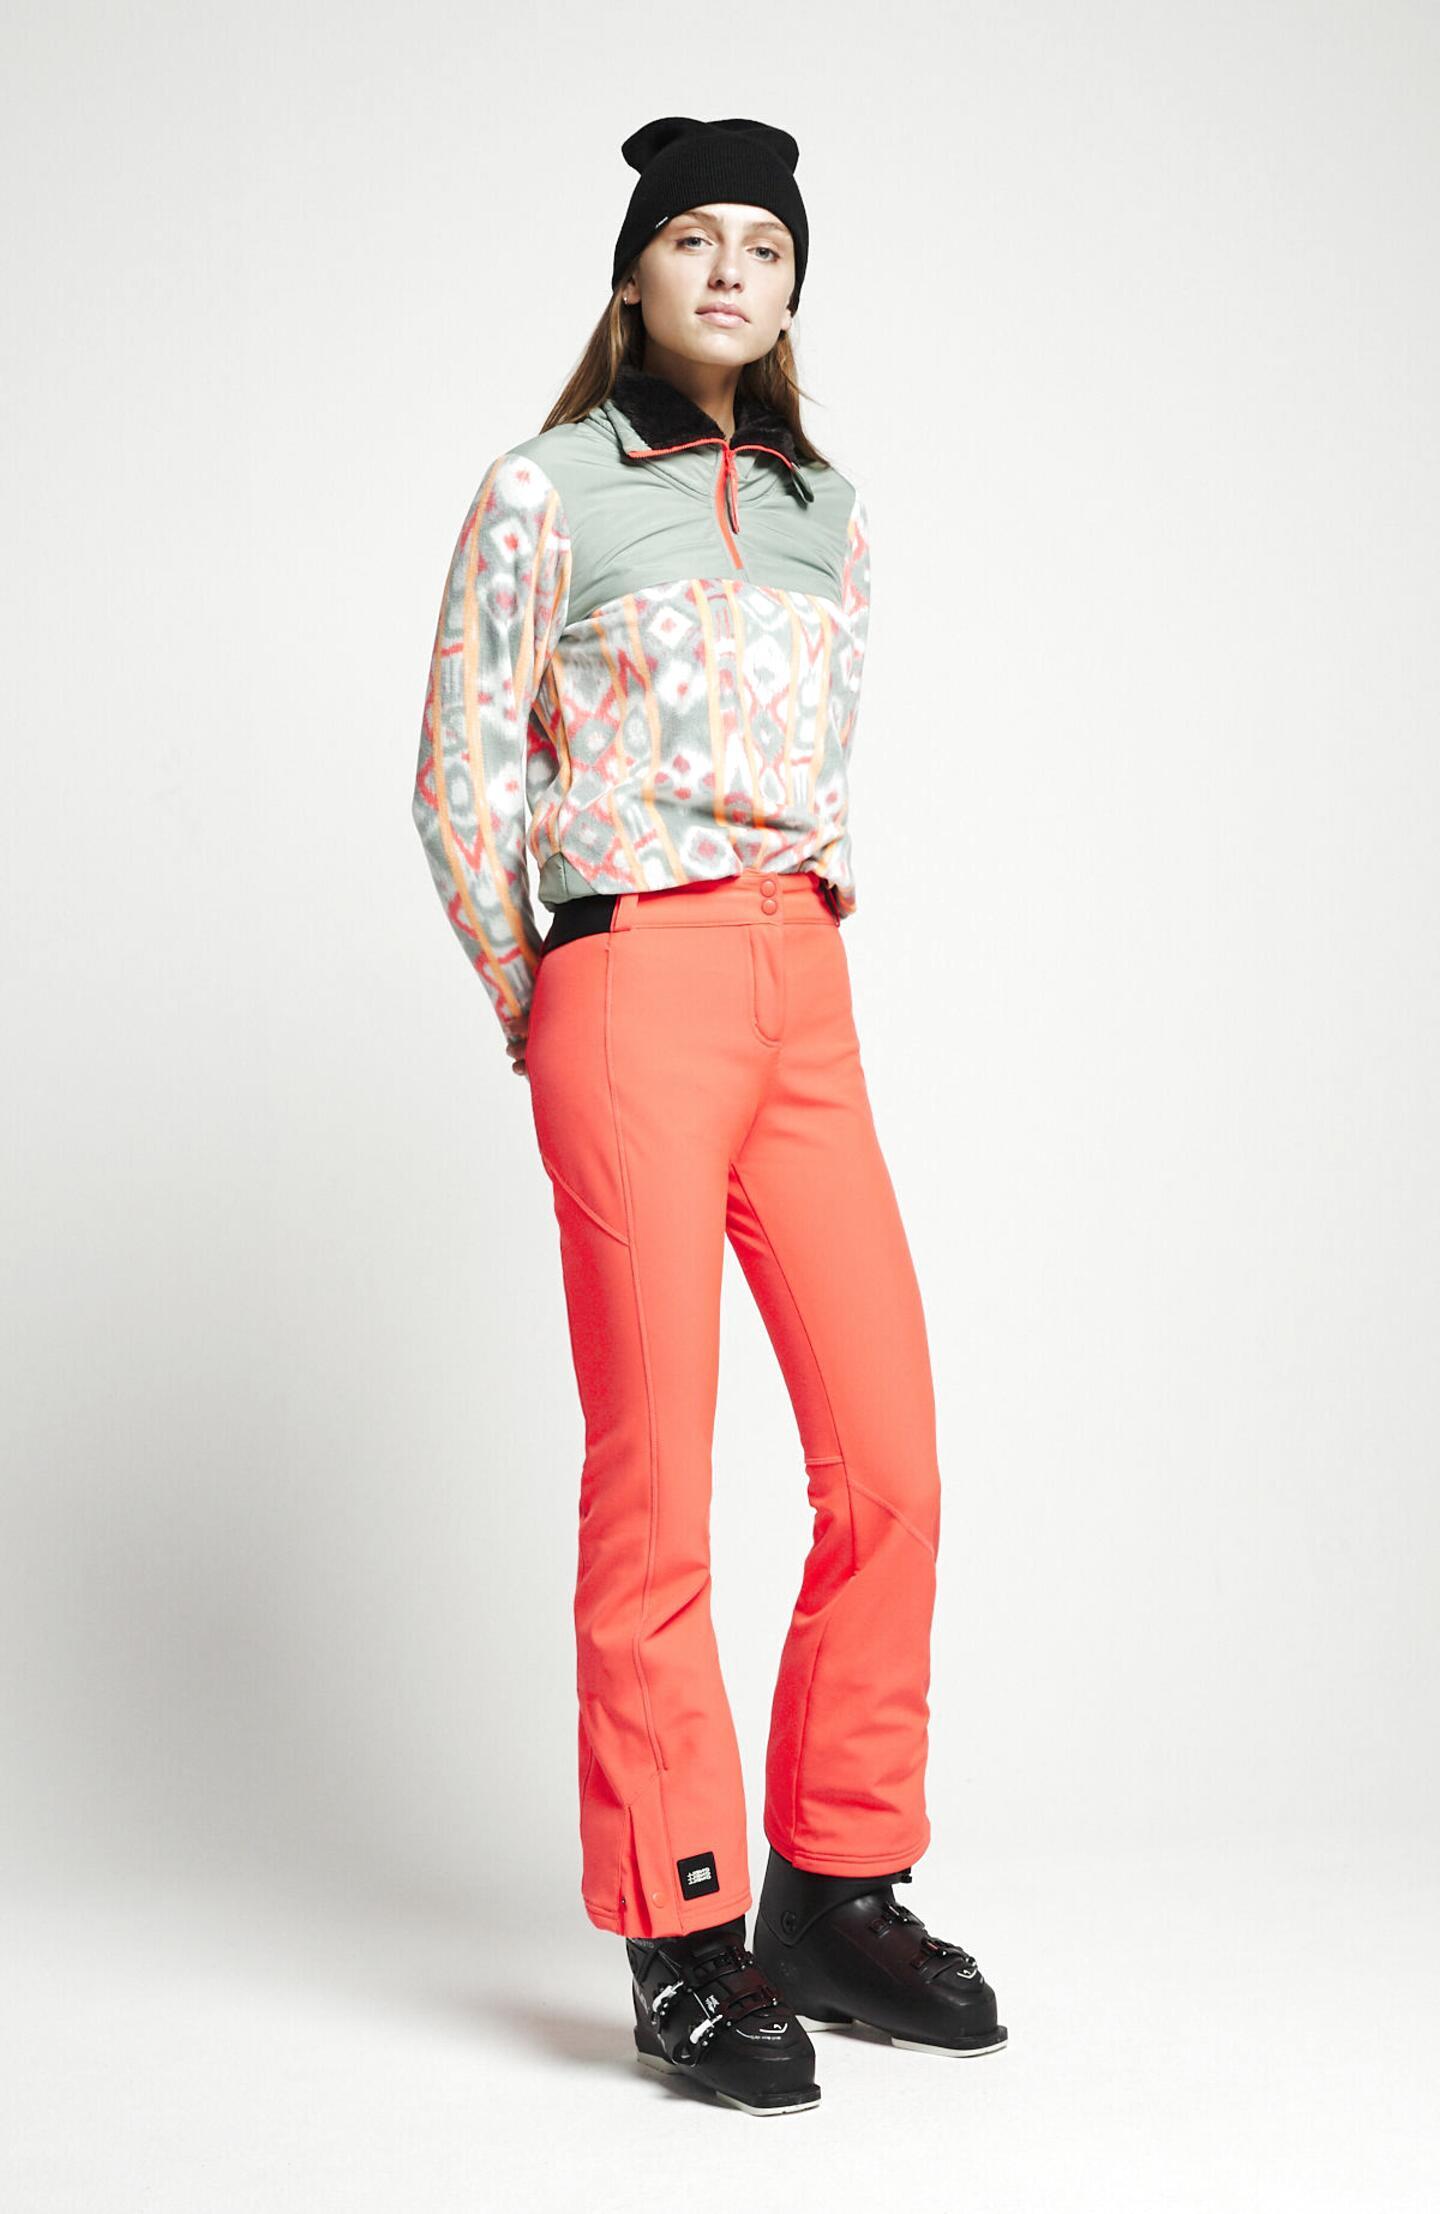 o neill ski pants for sale